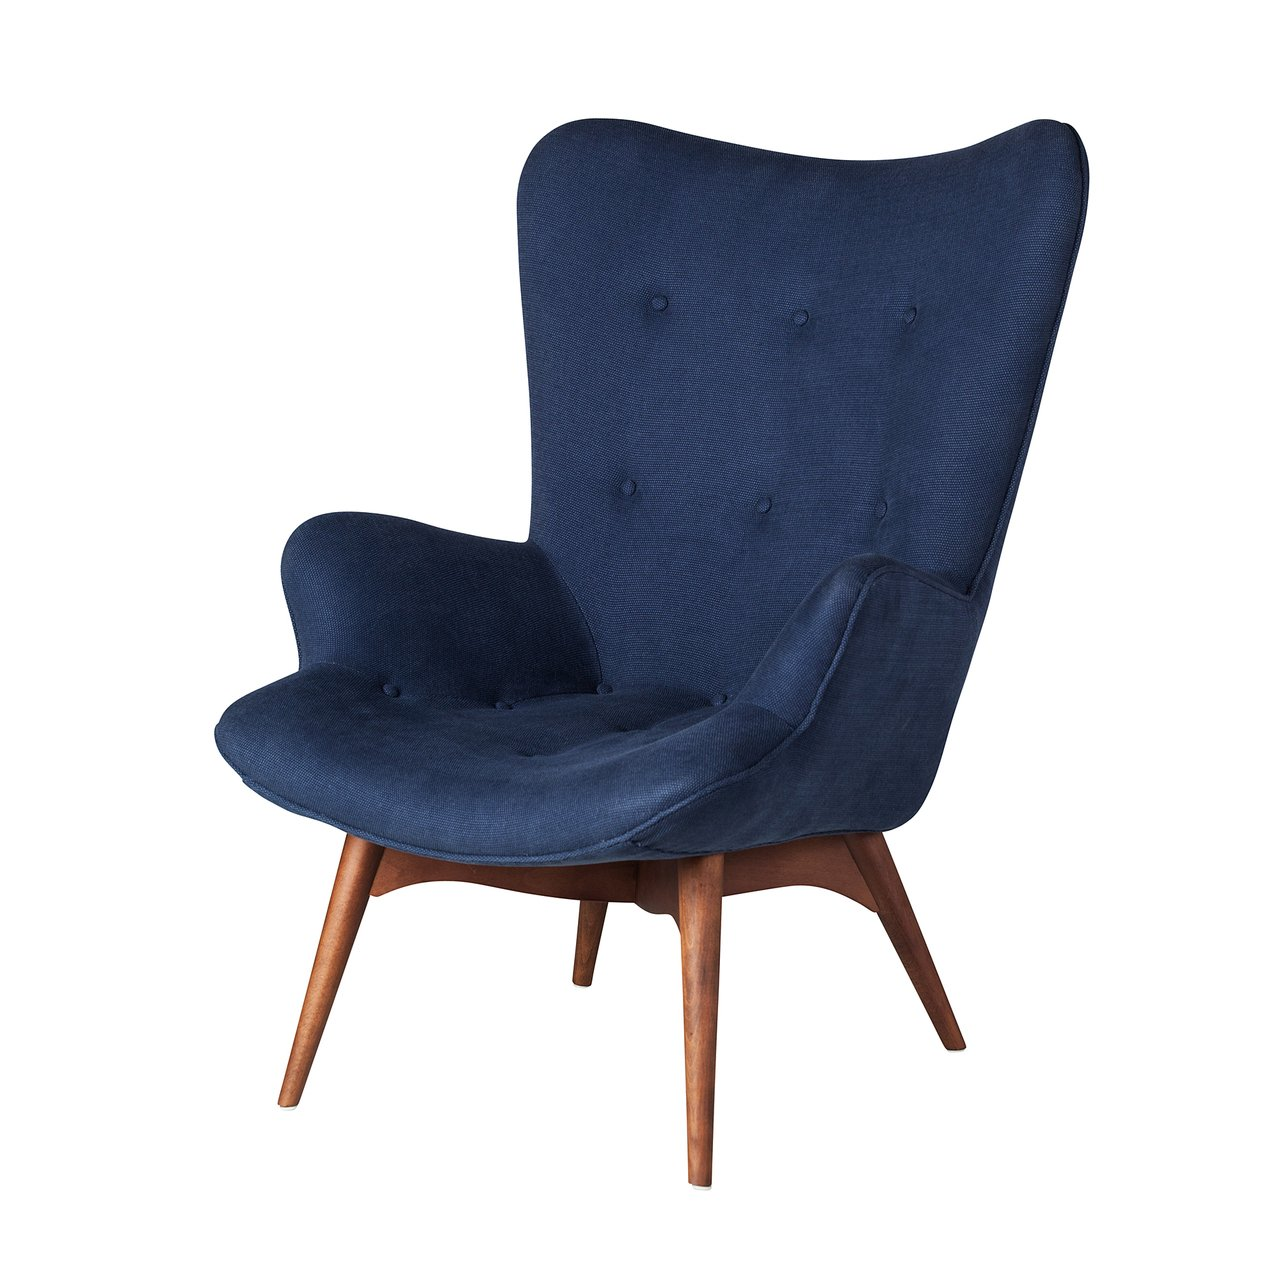 Amazon.com: Featherston silla de contorno de estilo en azul ...